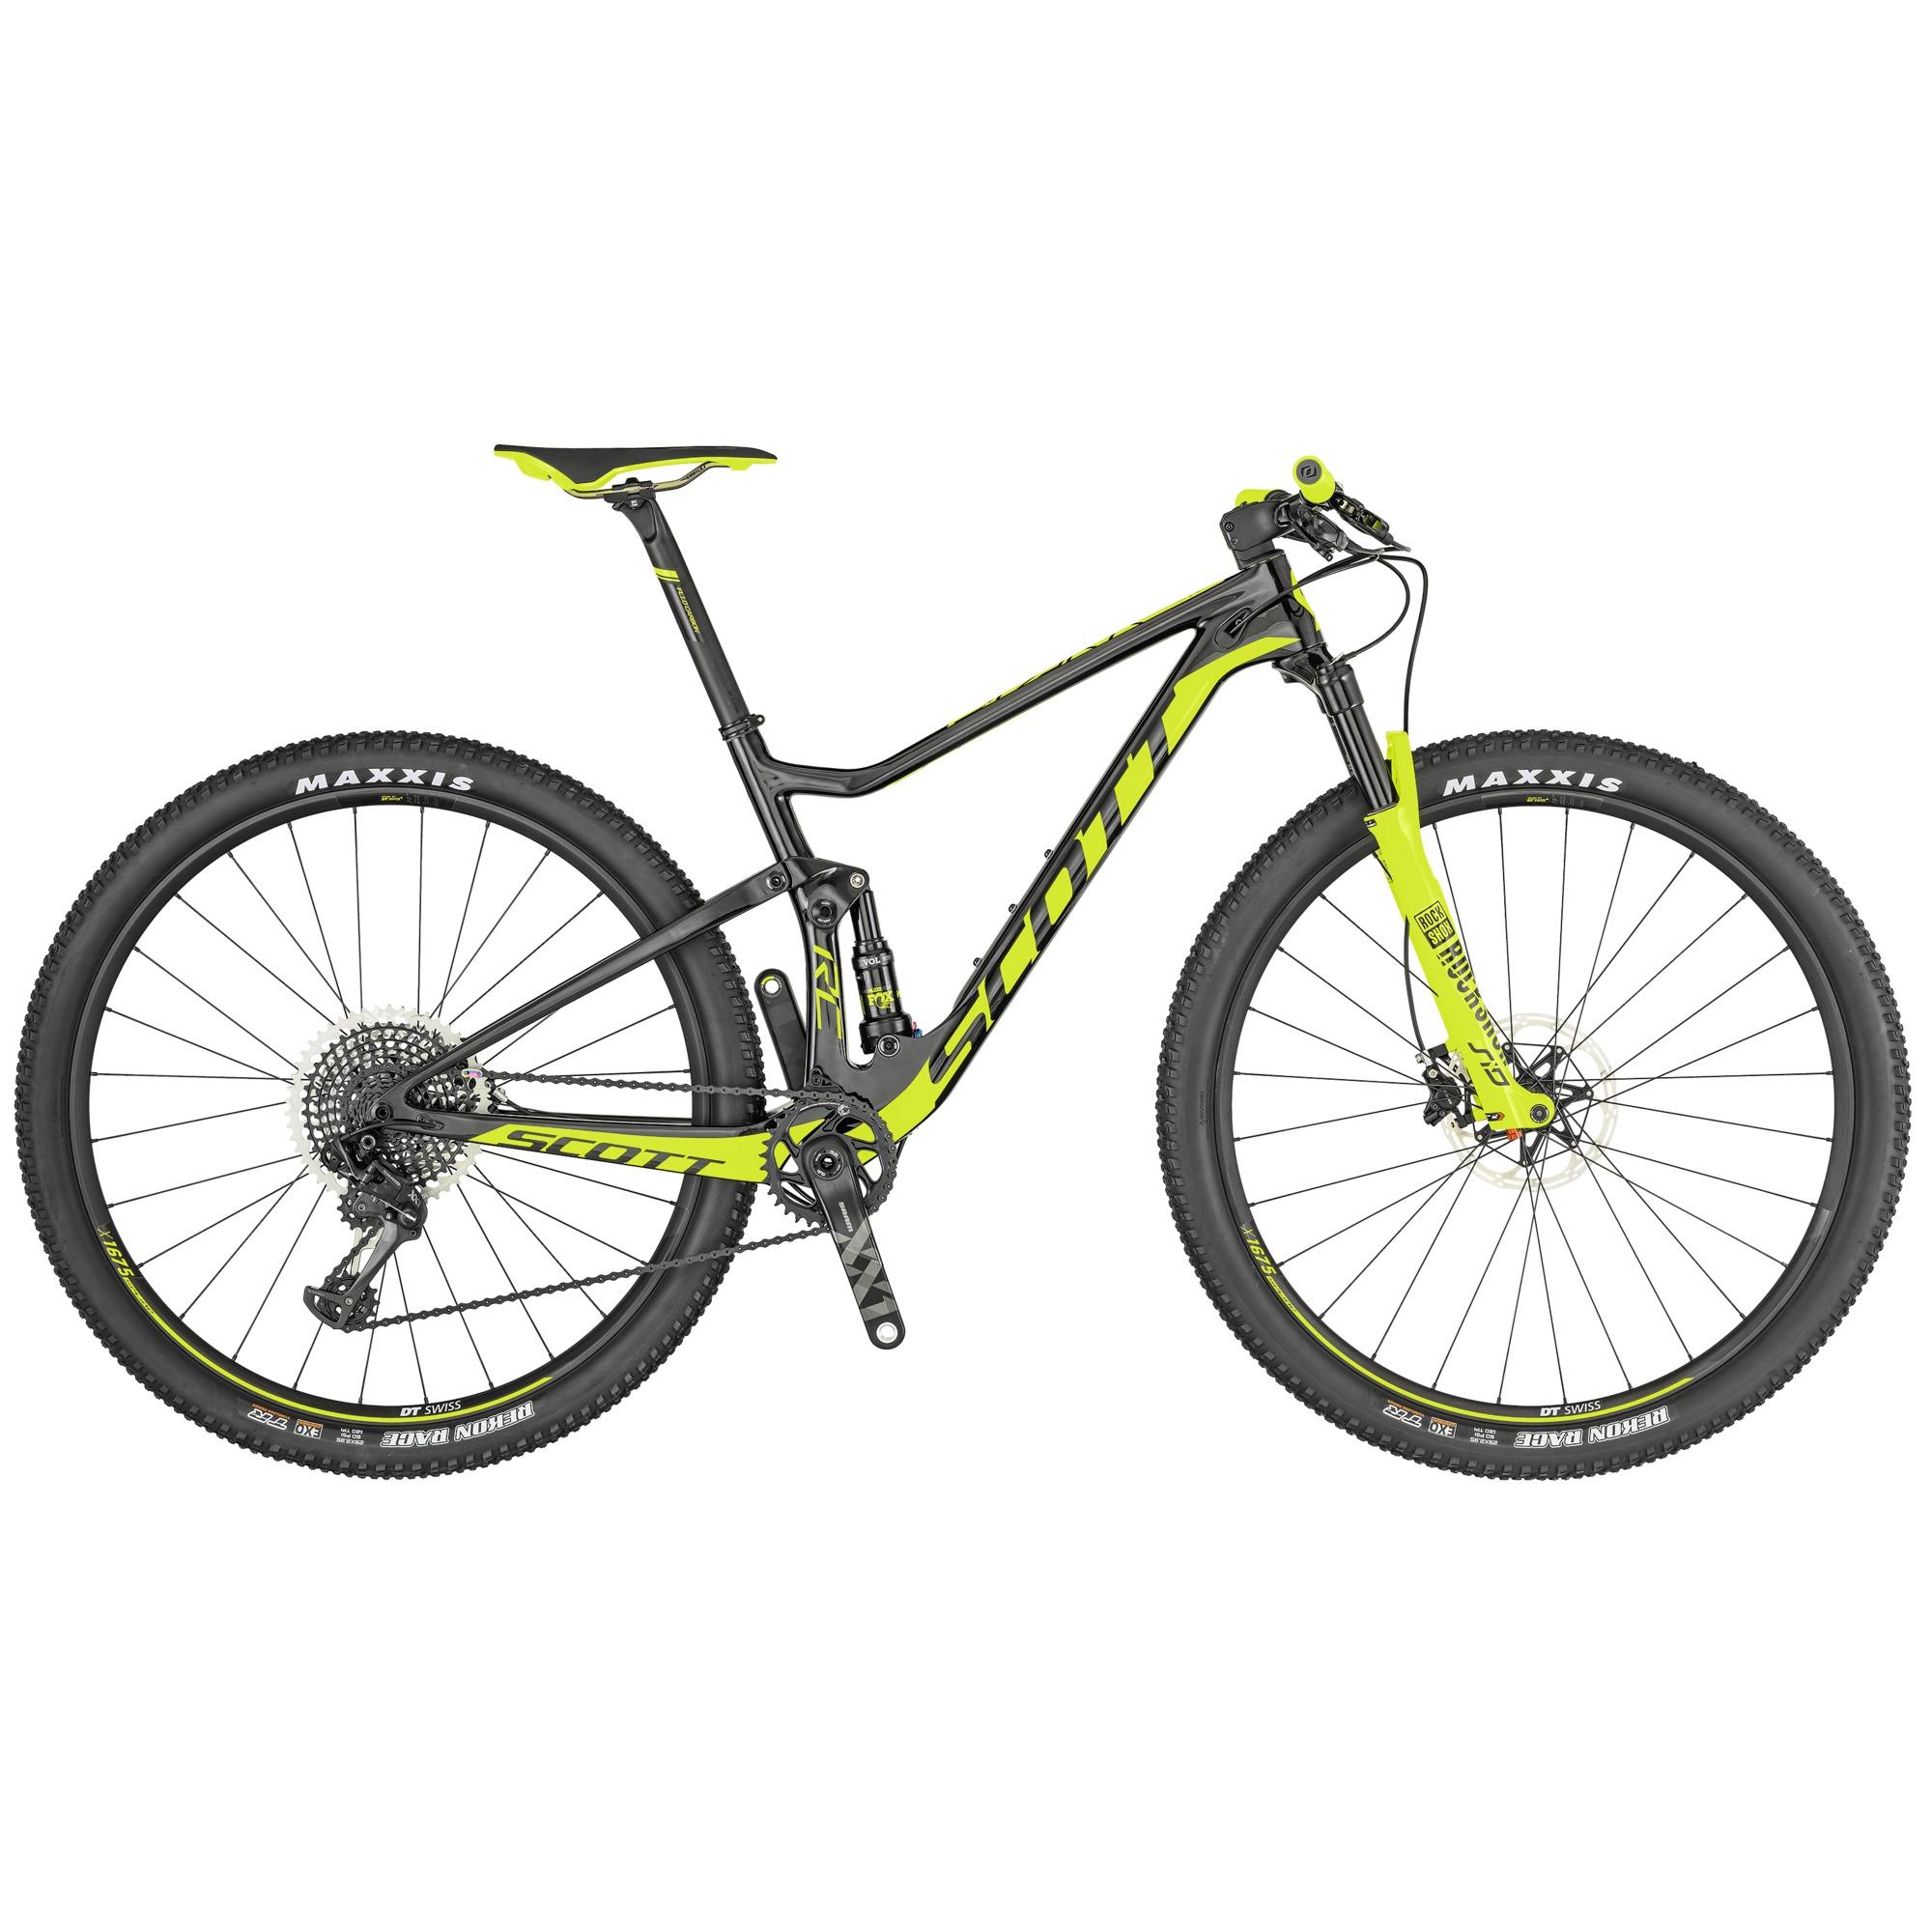 SCOTT Spark RC 900 World Cup Bike L - Fahrrad online kaufen | Online Shop Bike Profis